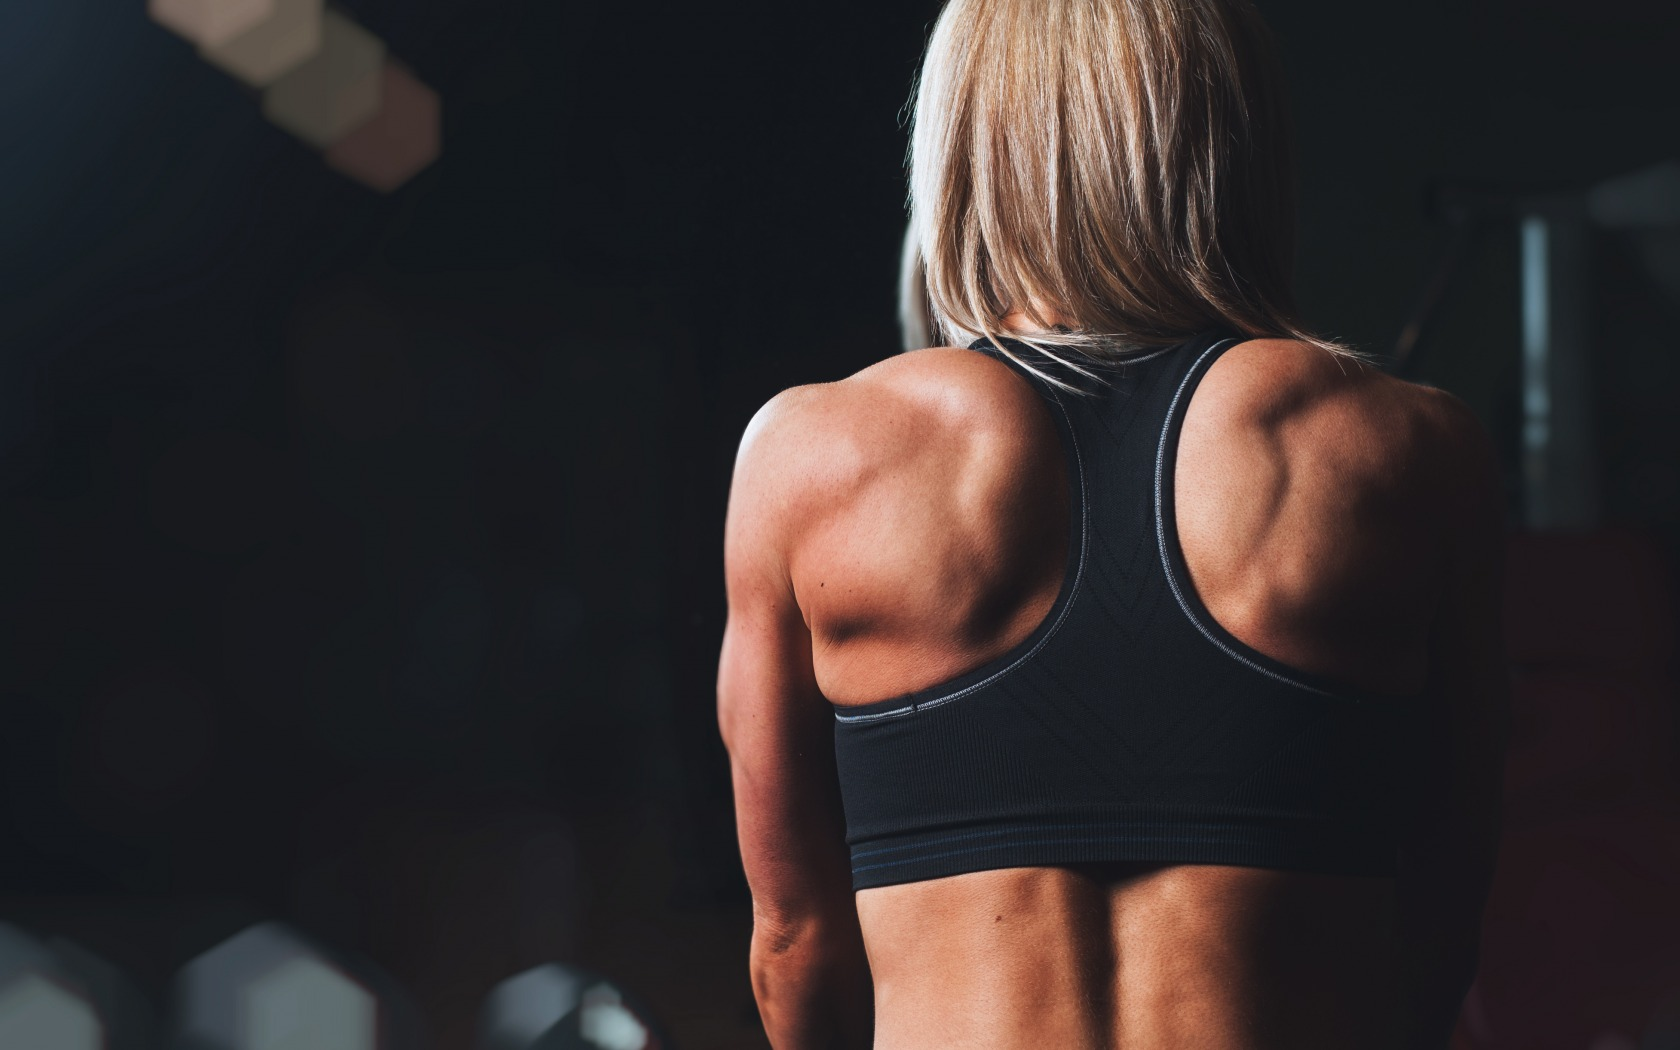 Bodybuilding Muscle Girl Fitness Wallpaper Hd Wallpapers